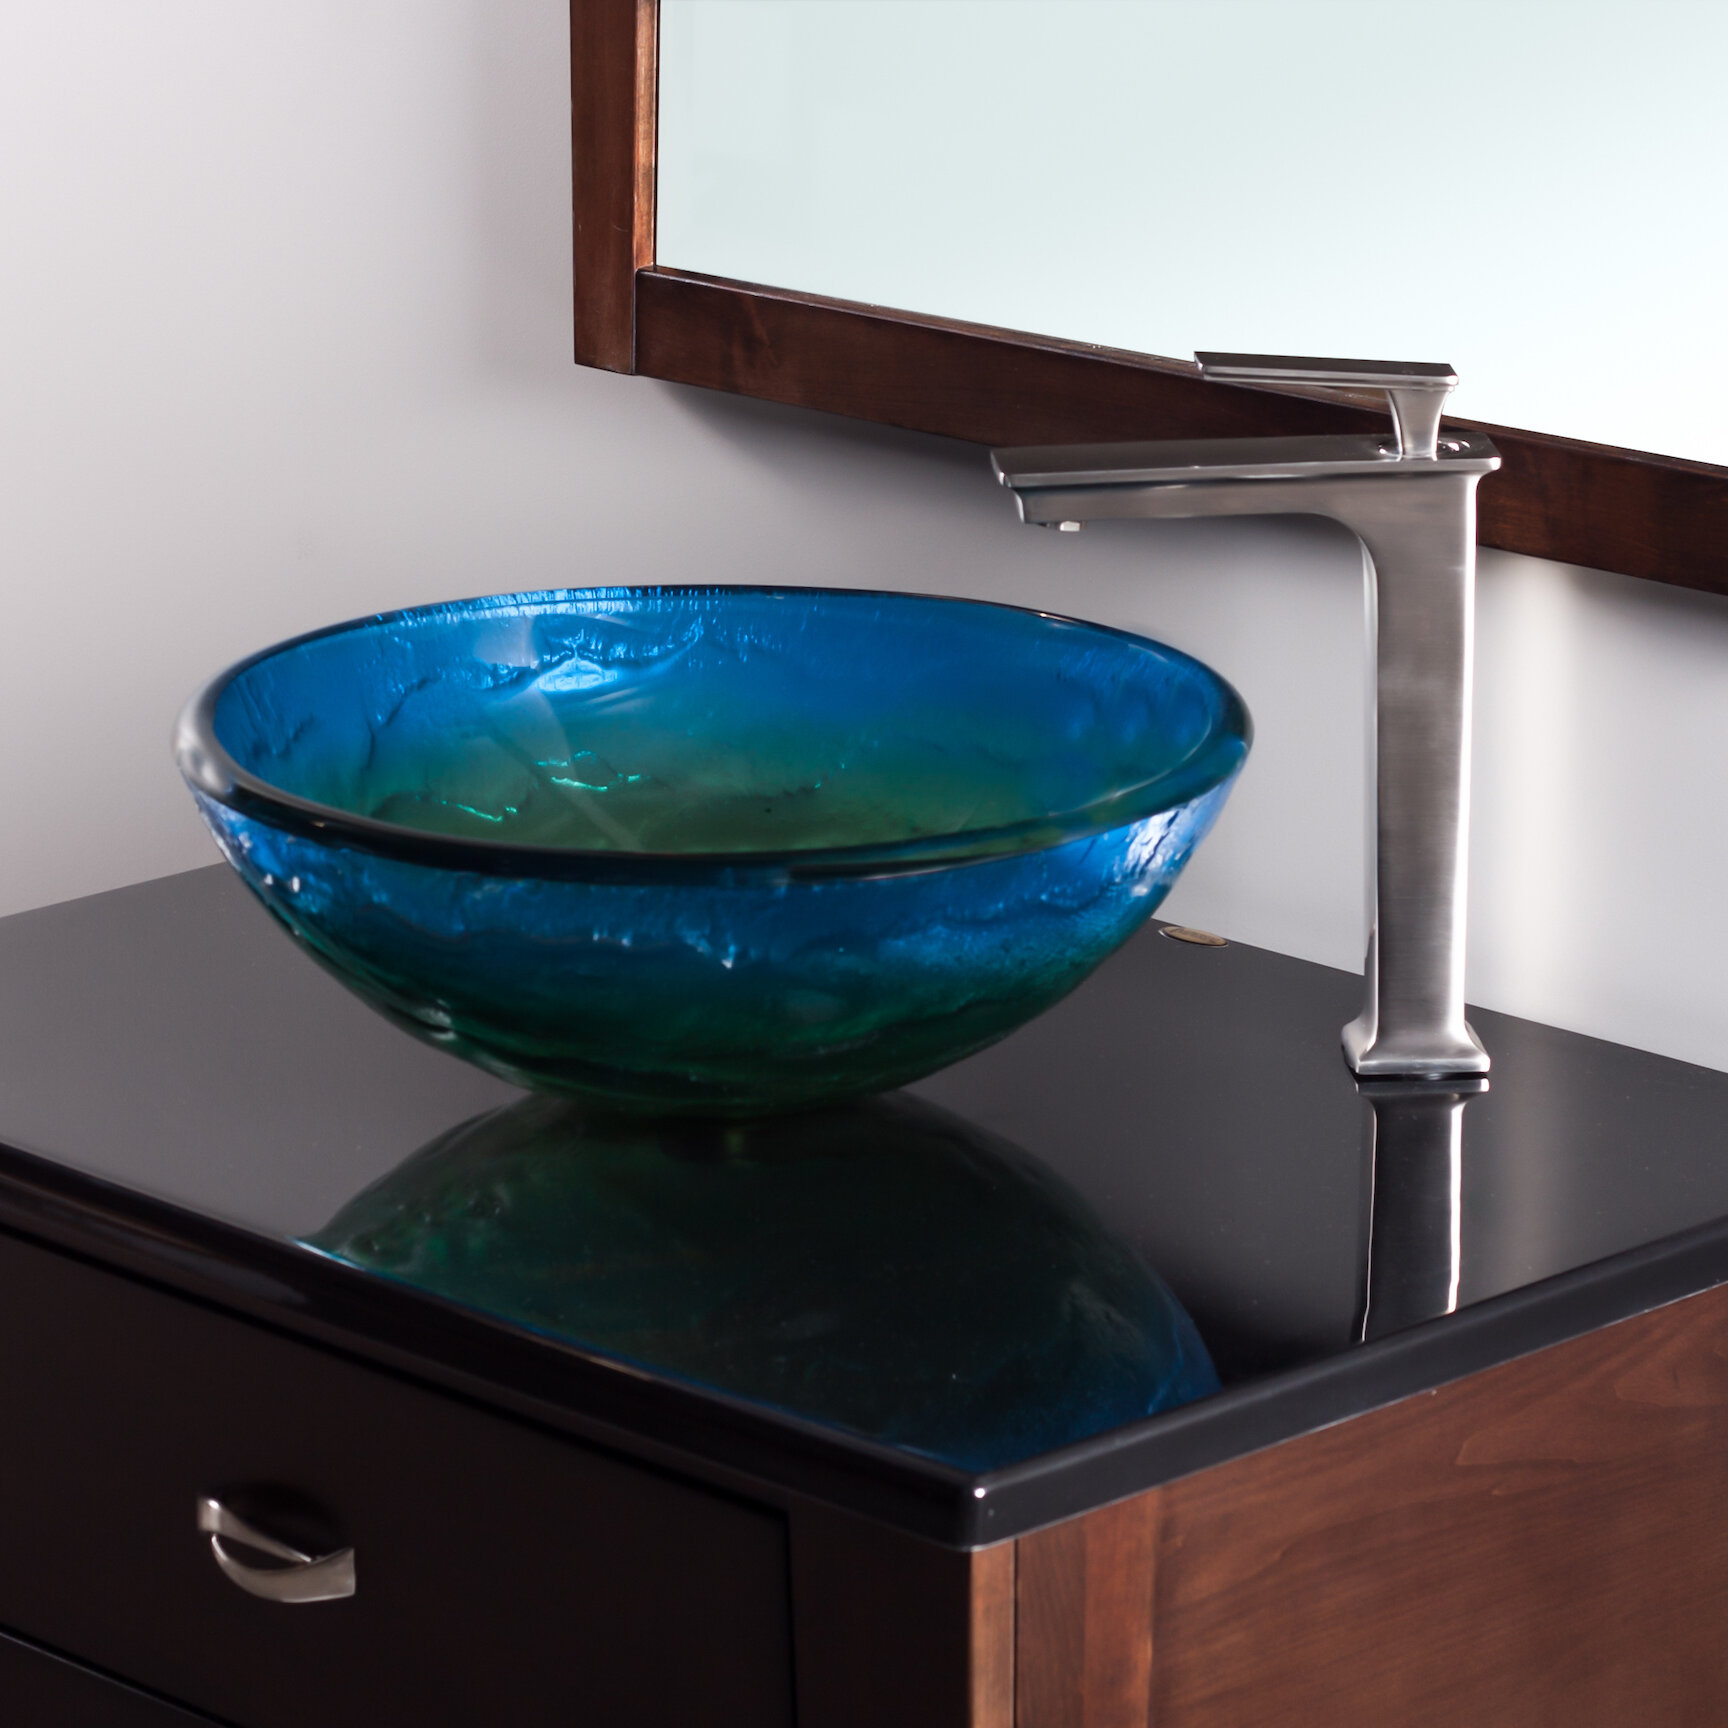 Novatto Mare Glass Circular Vessel Bathroom Sink & Reviews | Wayfair